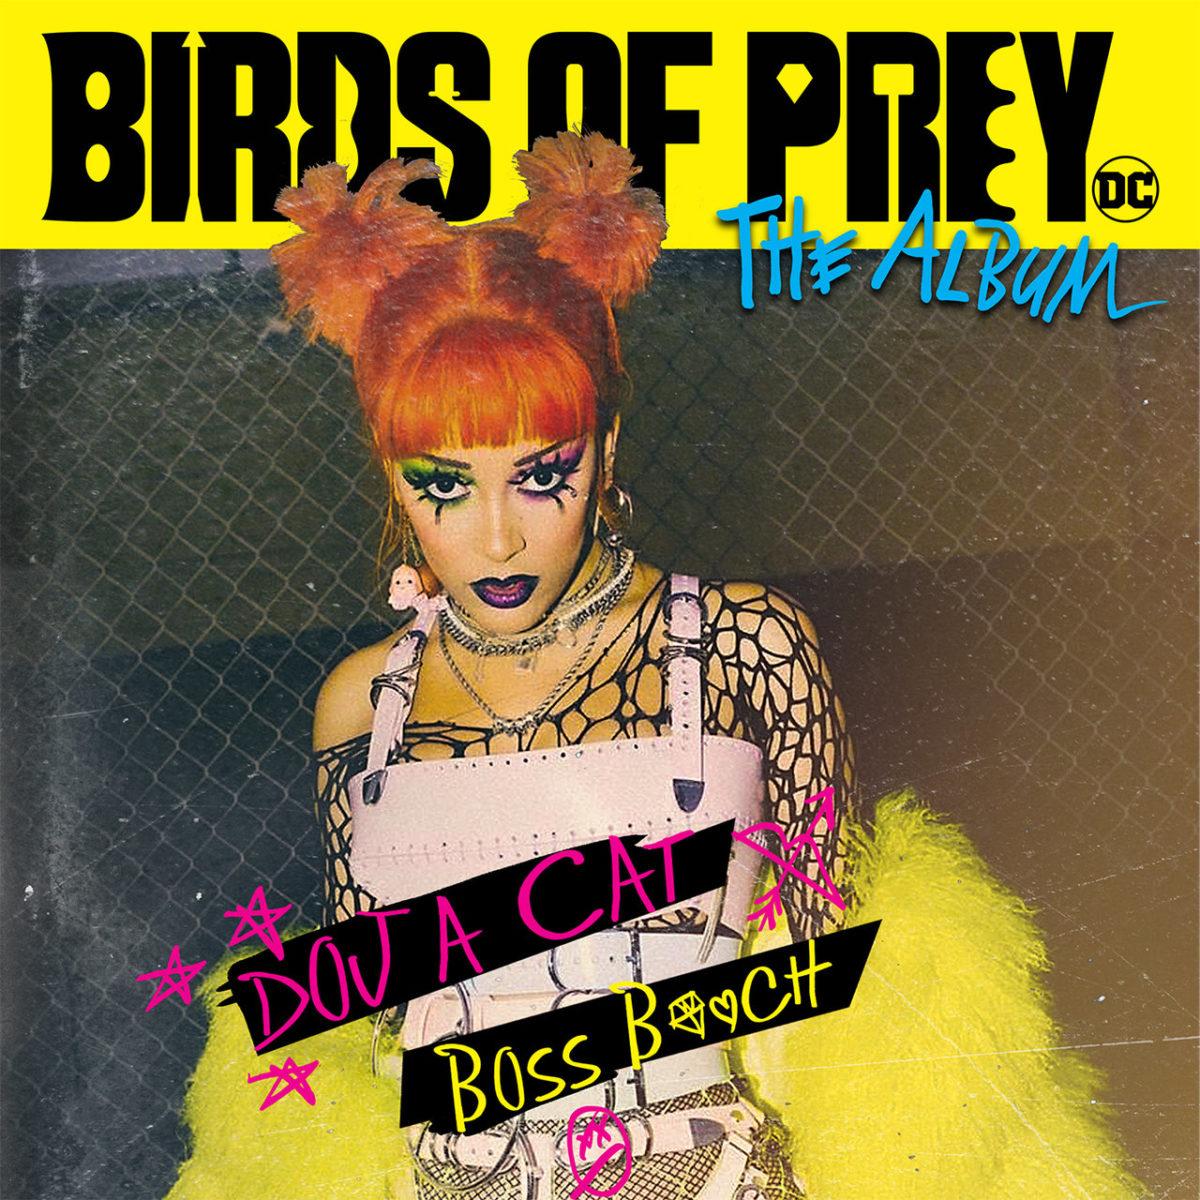 Doja Cat - Boss Bitch (Cover)